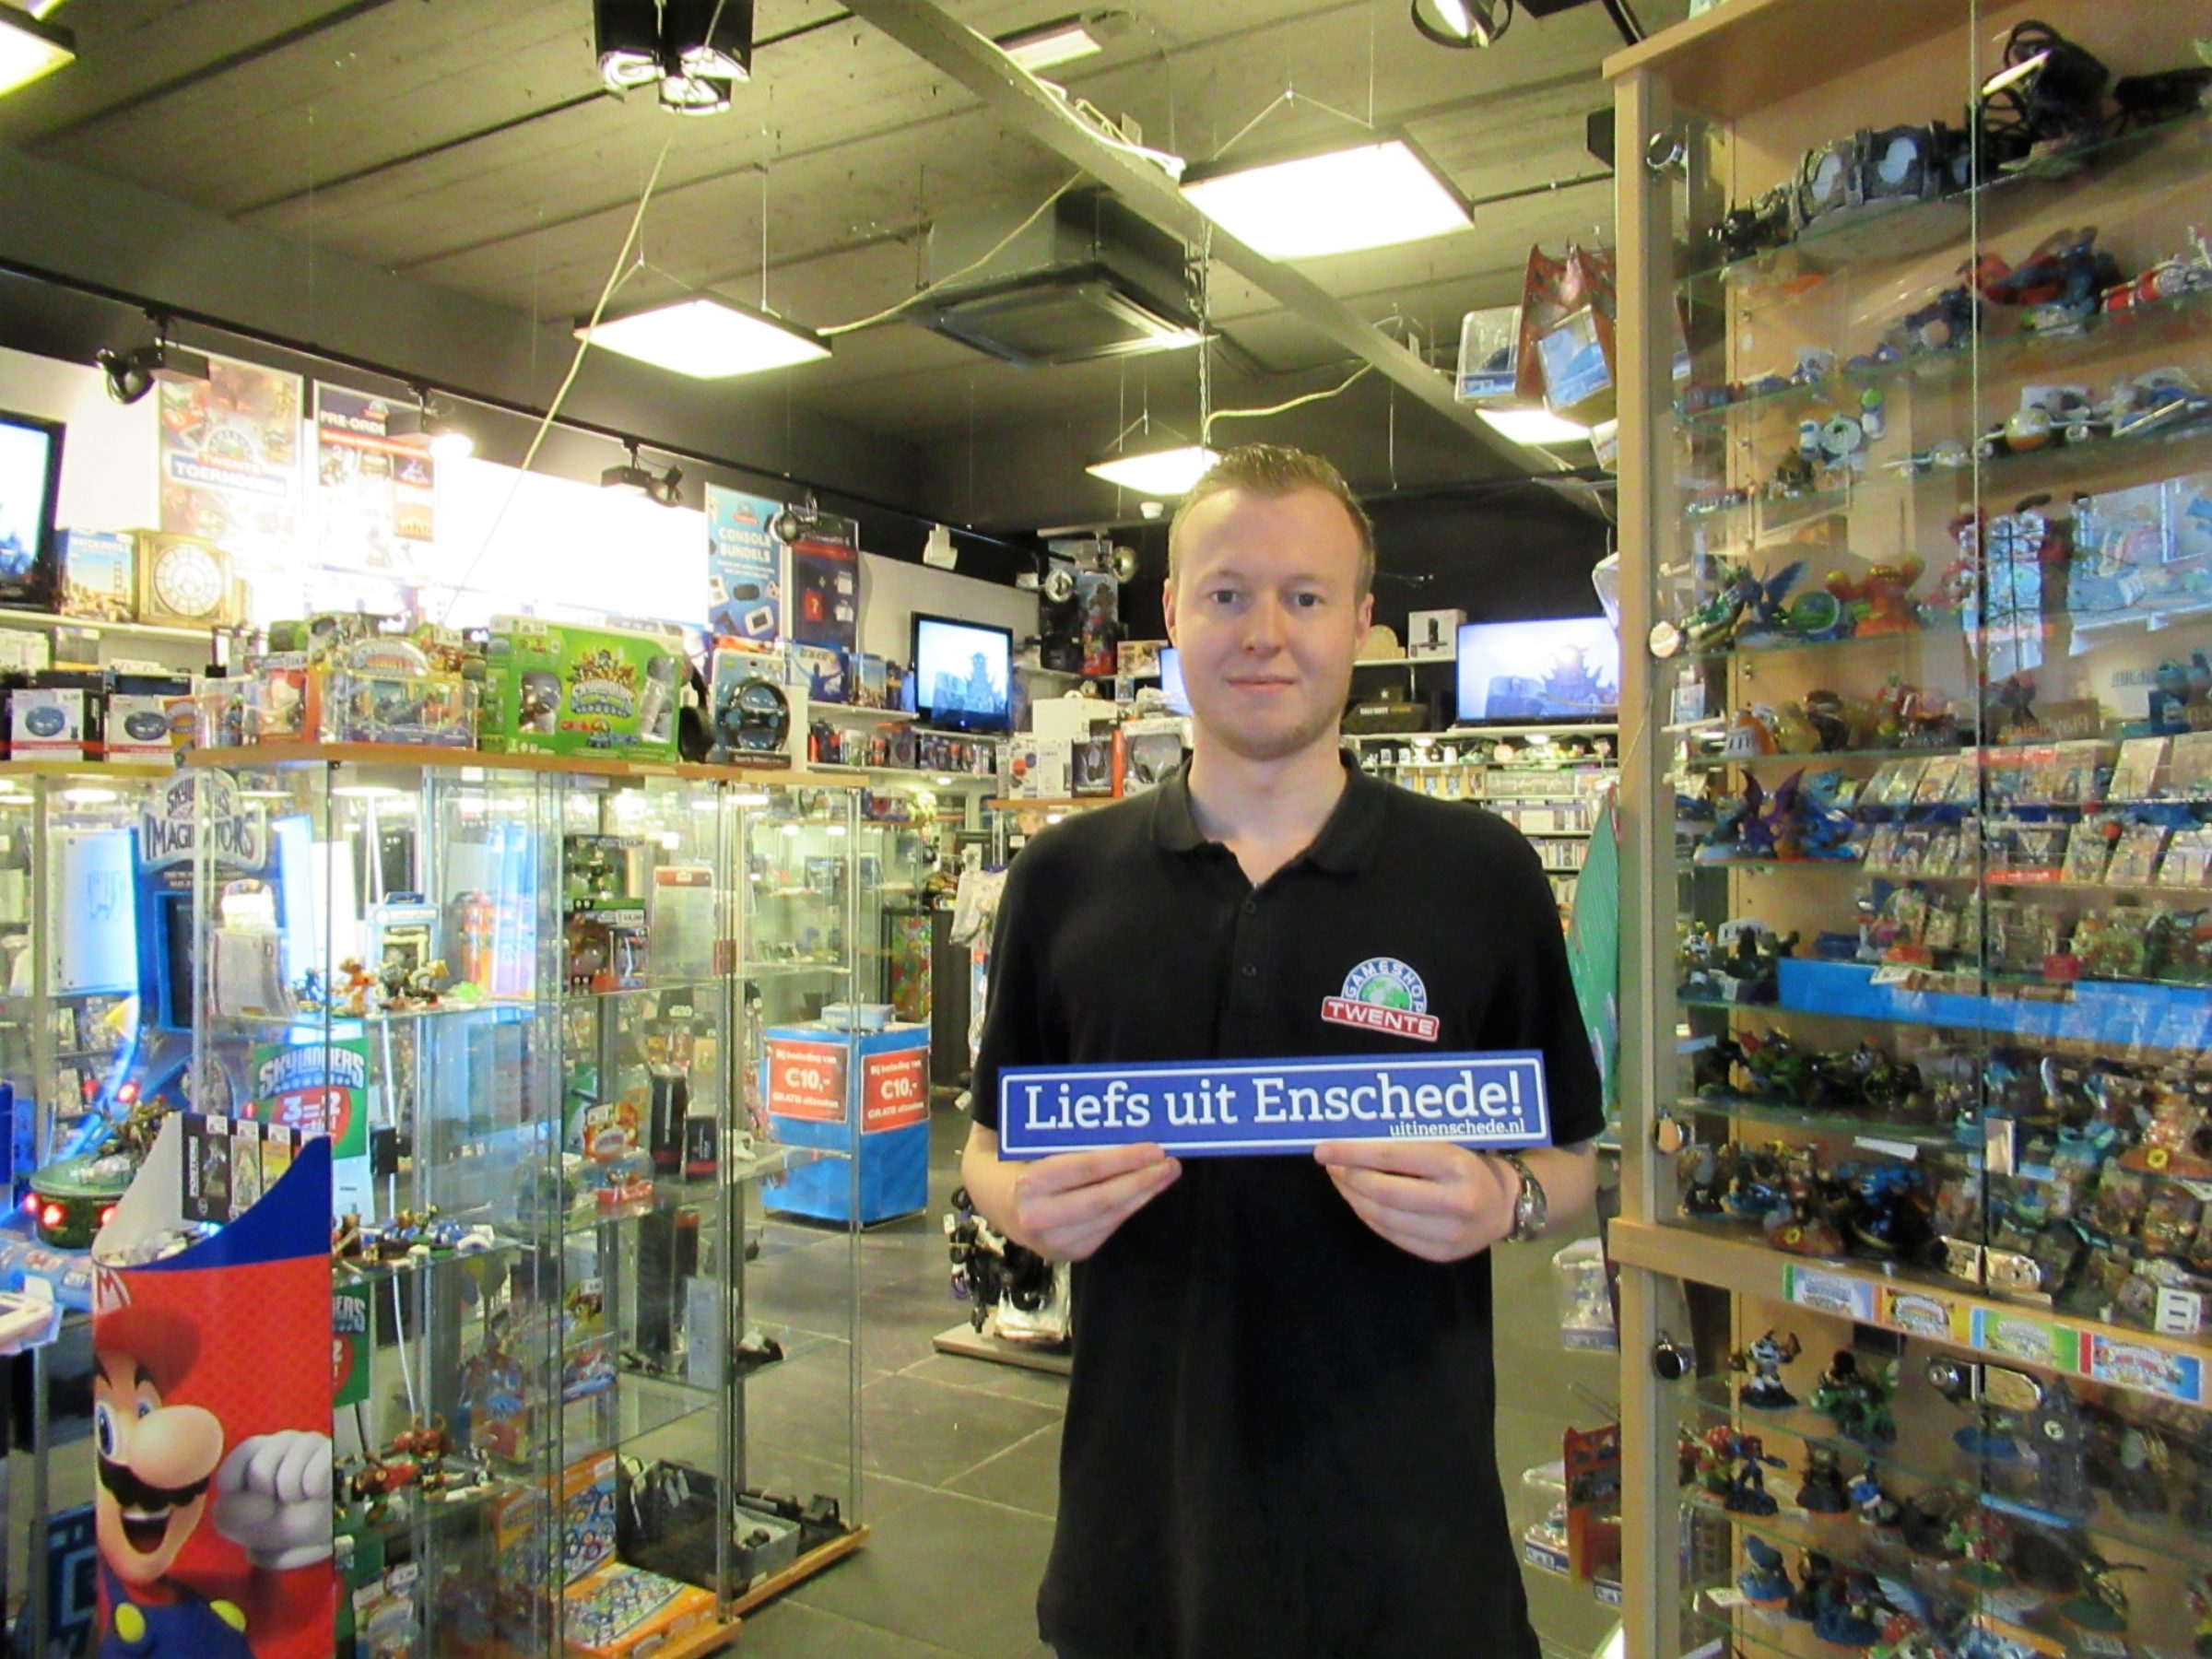 2017 Liefs Uit Enschede Gameshop Marketing En Campagnes